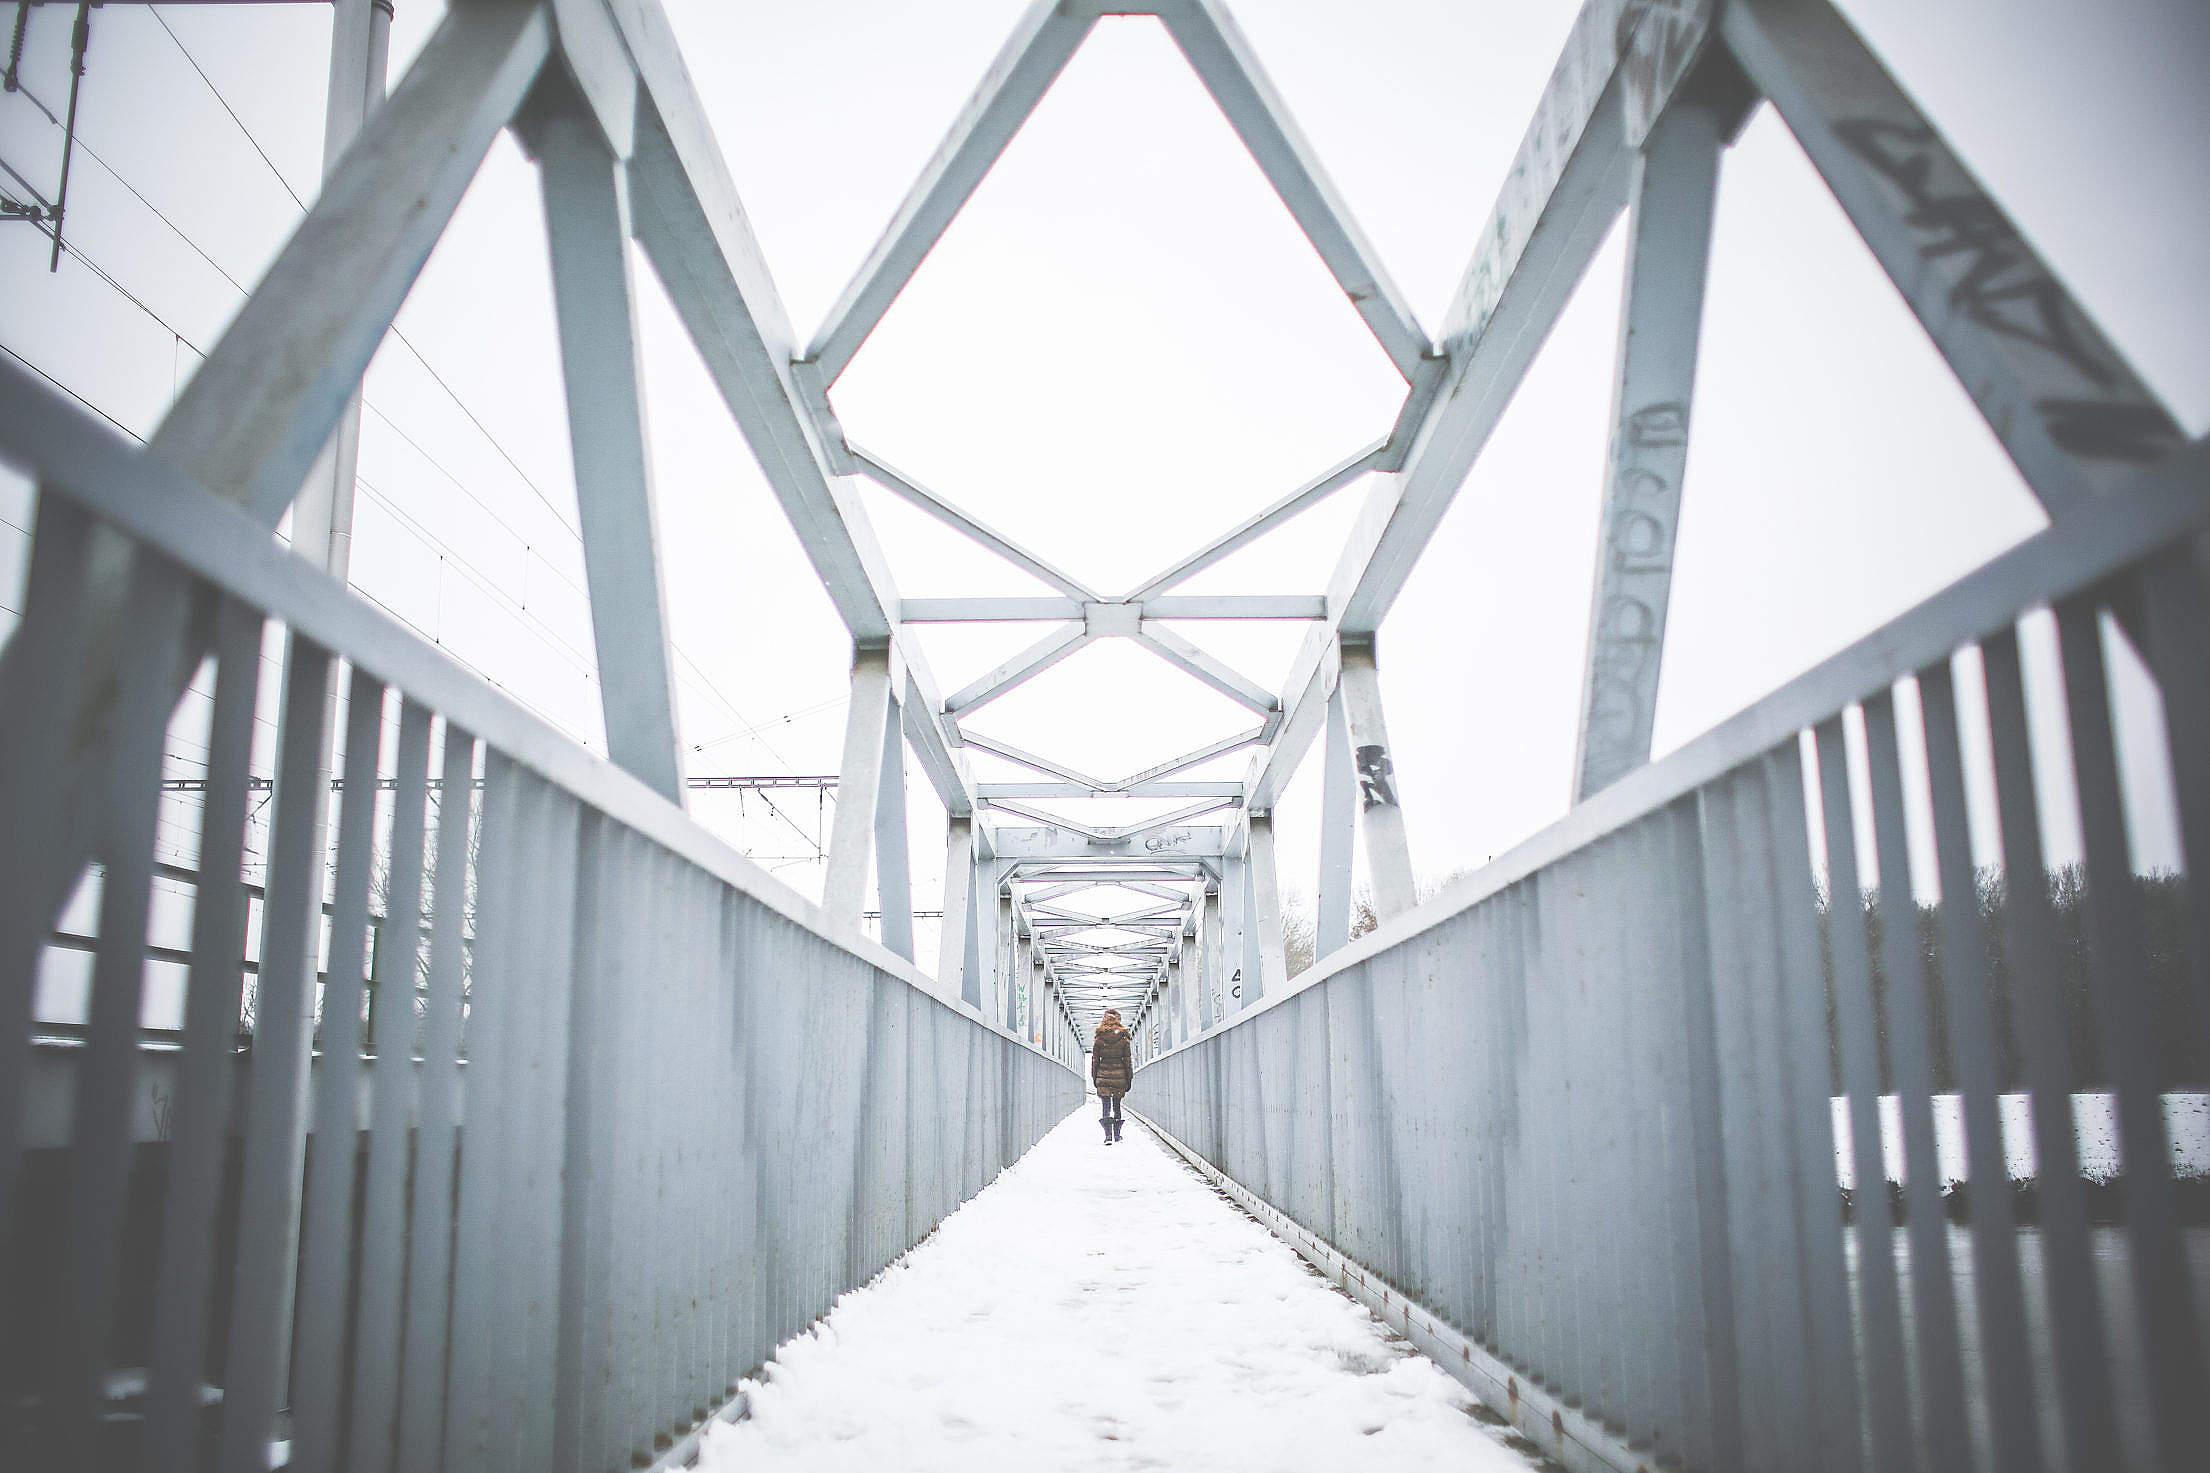 Girl Walking on Steel Bridge in Winter Free Stock Photo